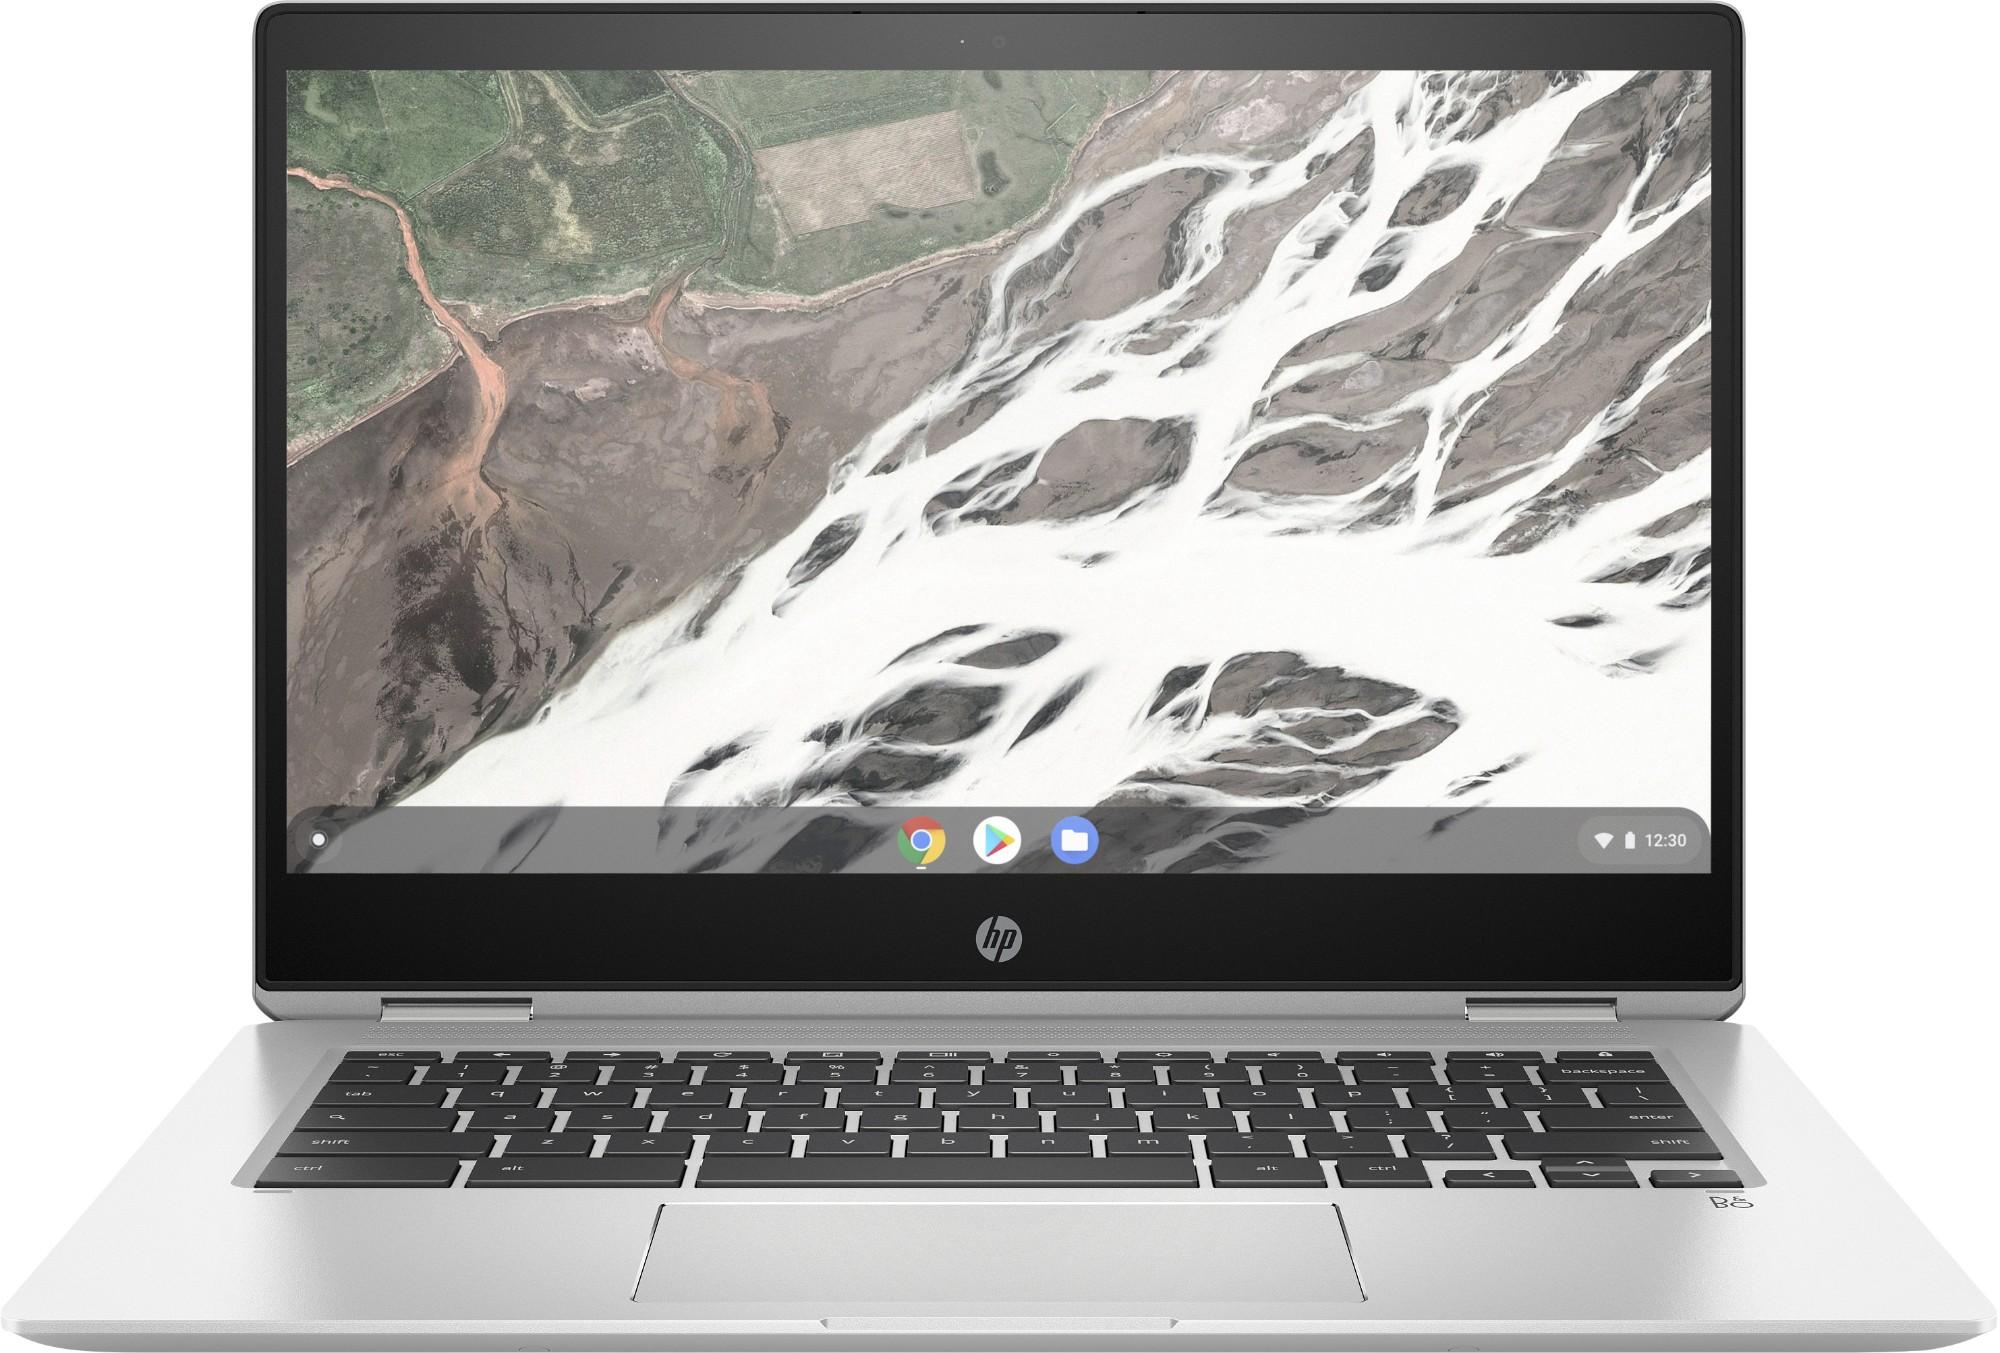 HP Chromebook x360 14 G1 Silver 35.6 cm (14